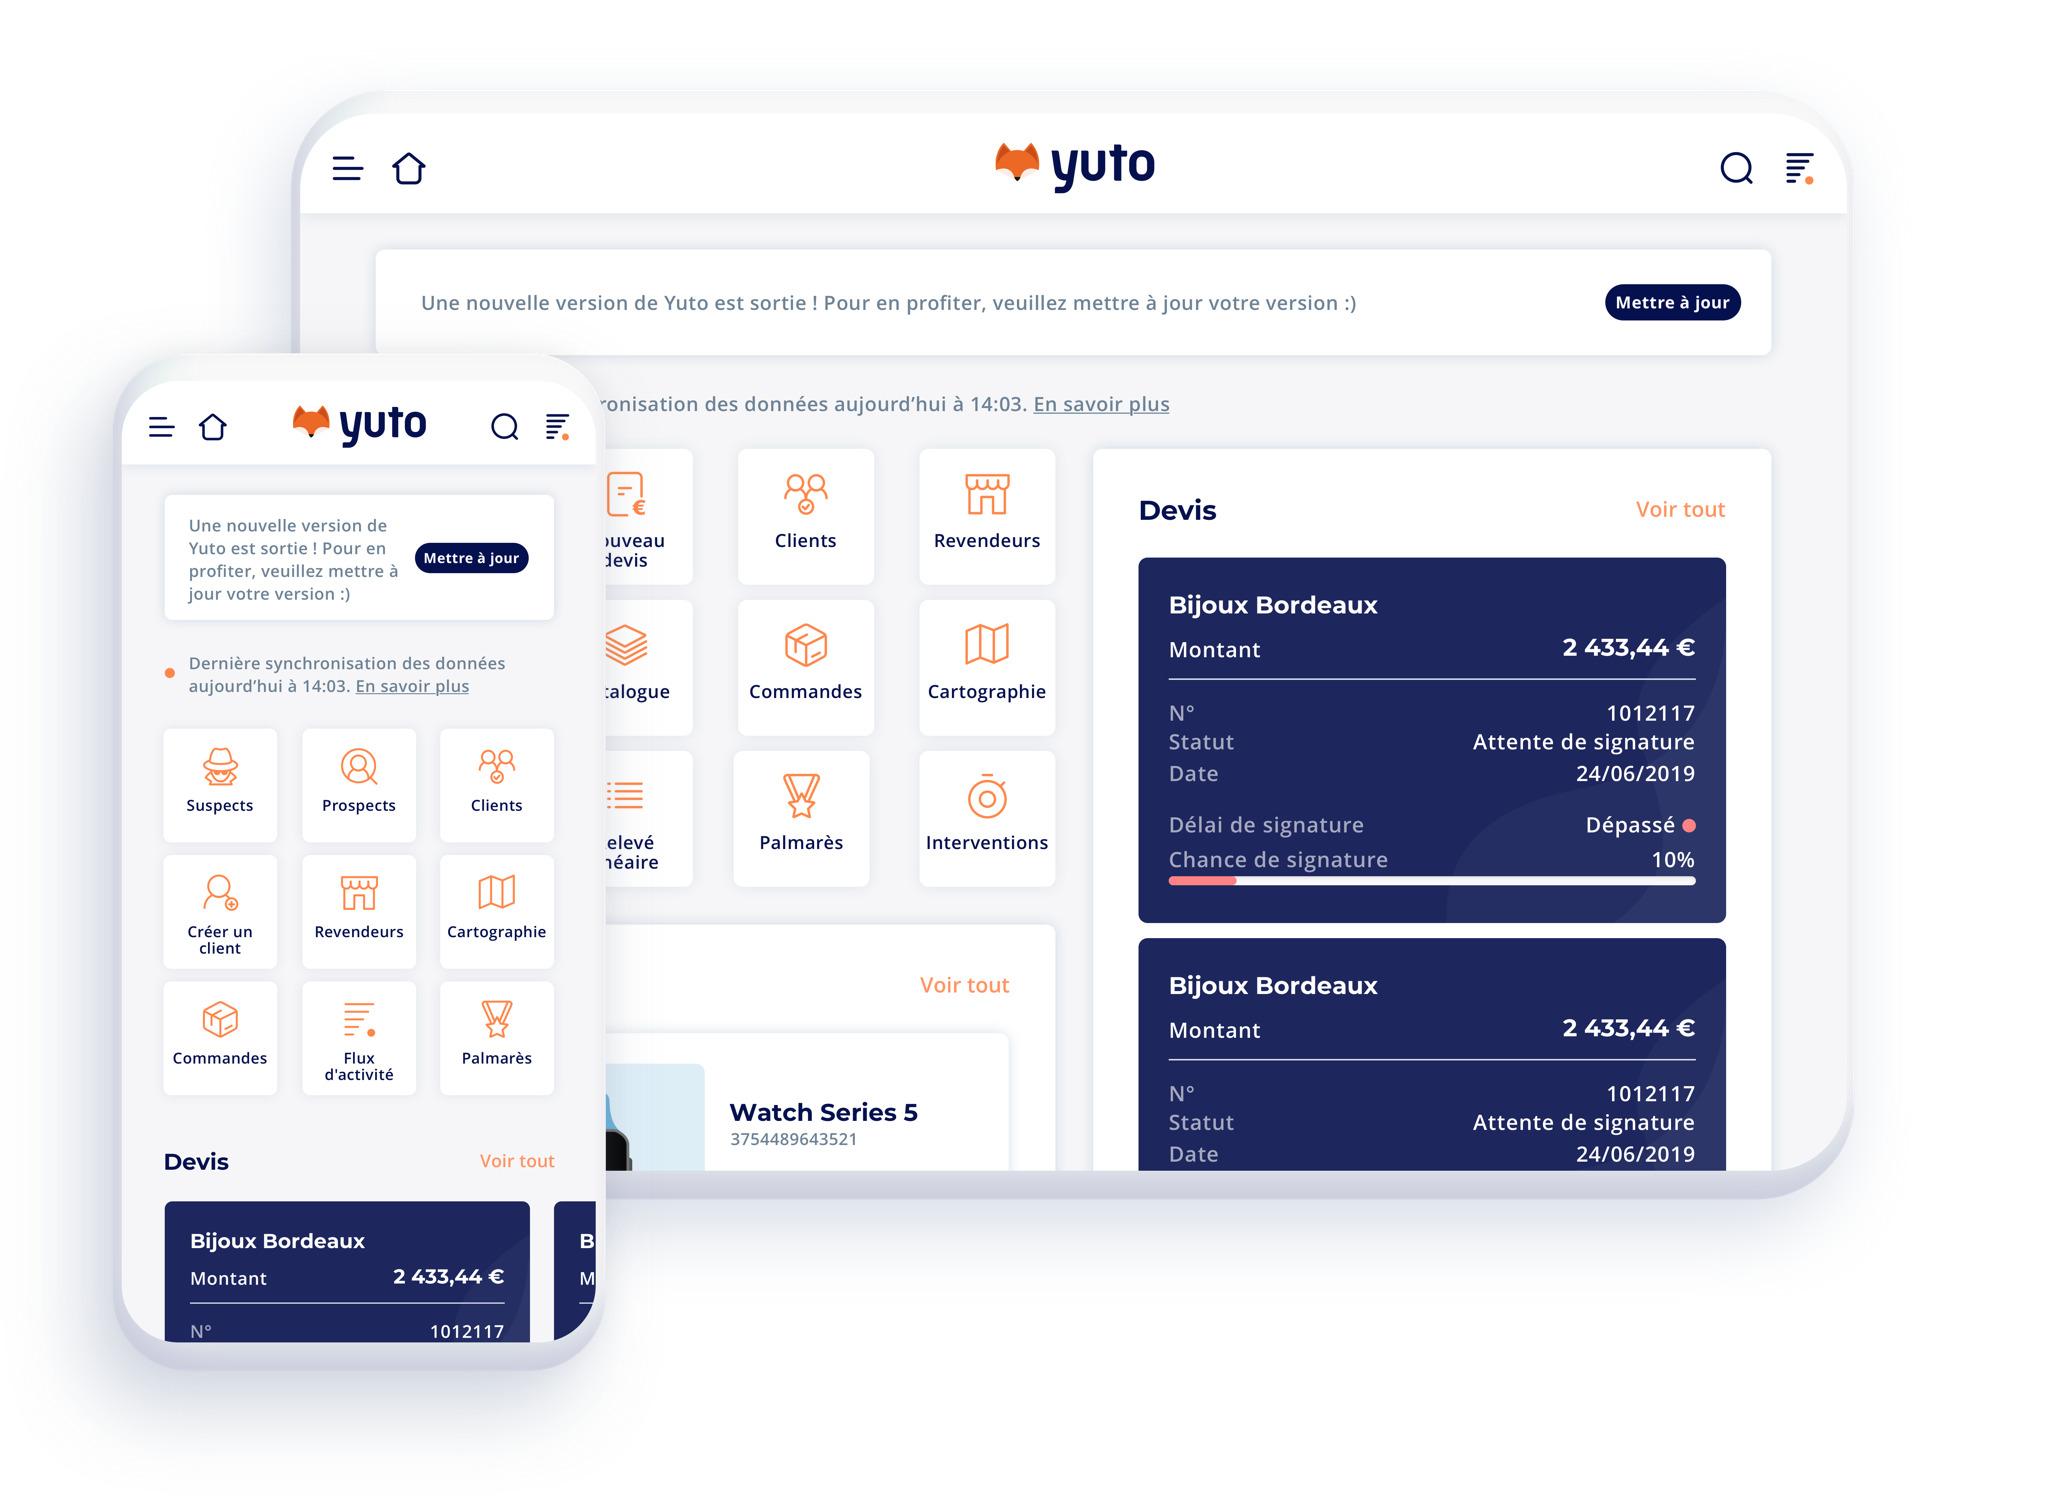 crm mobile : visuel Yuto